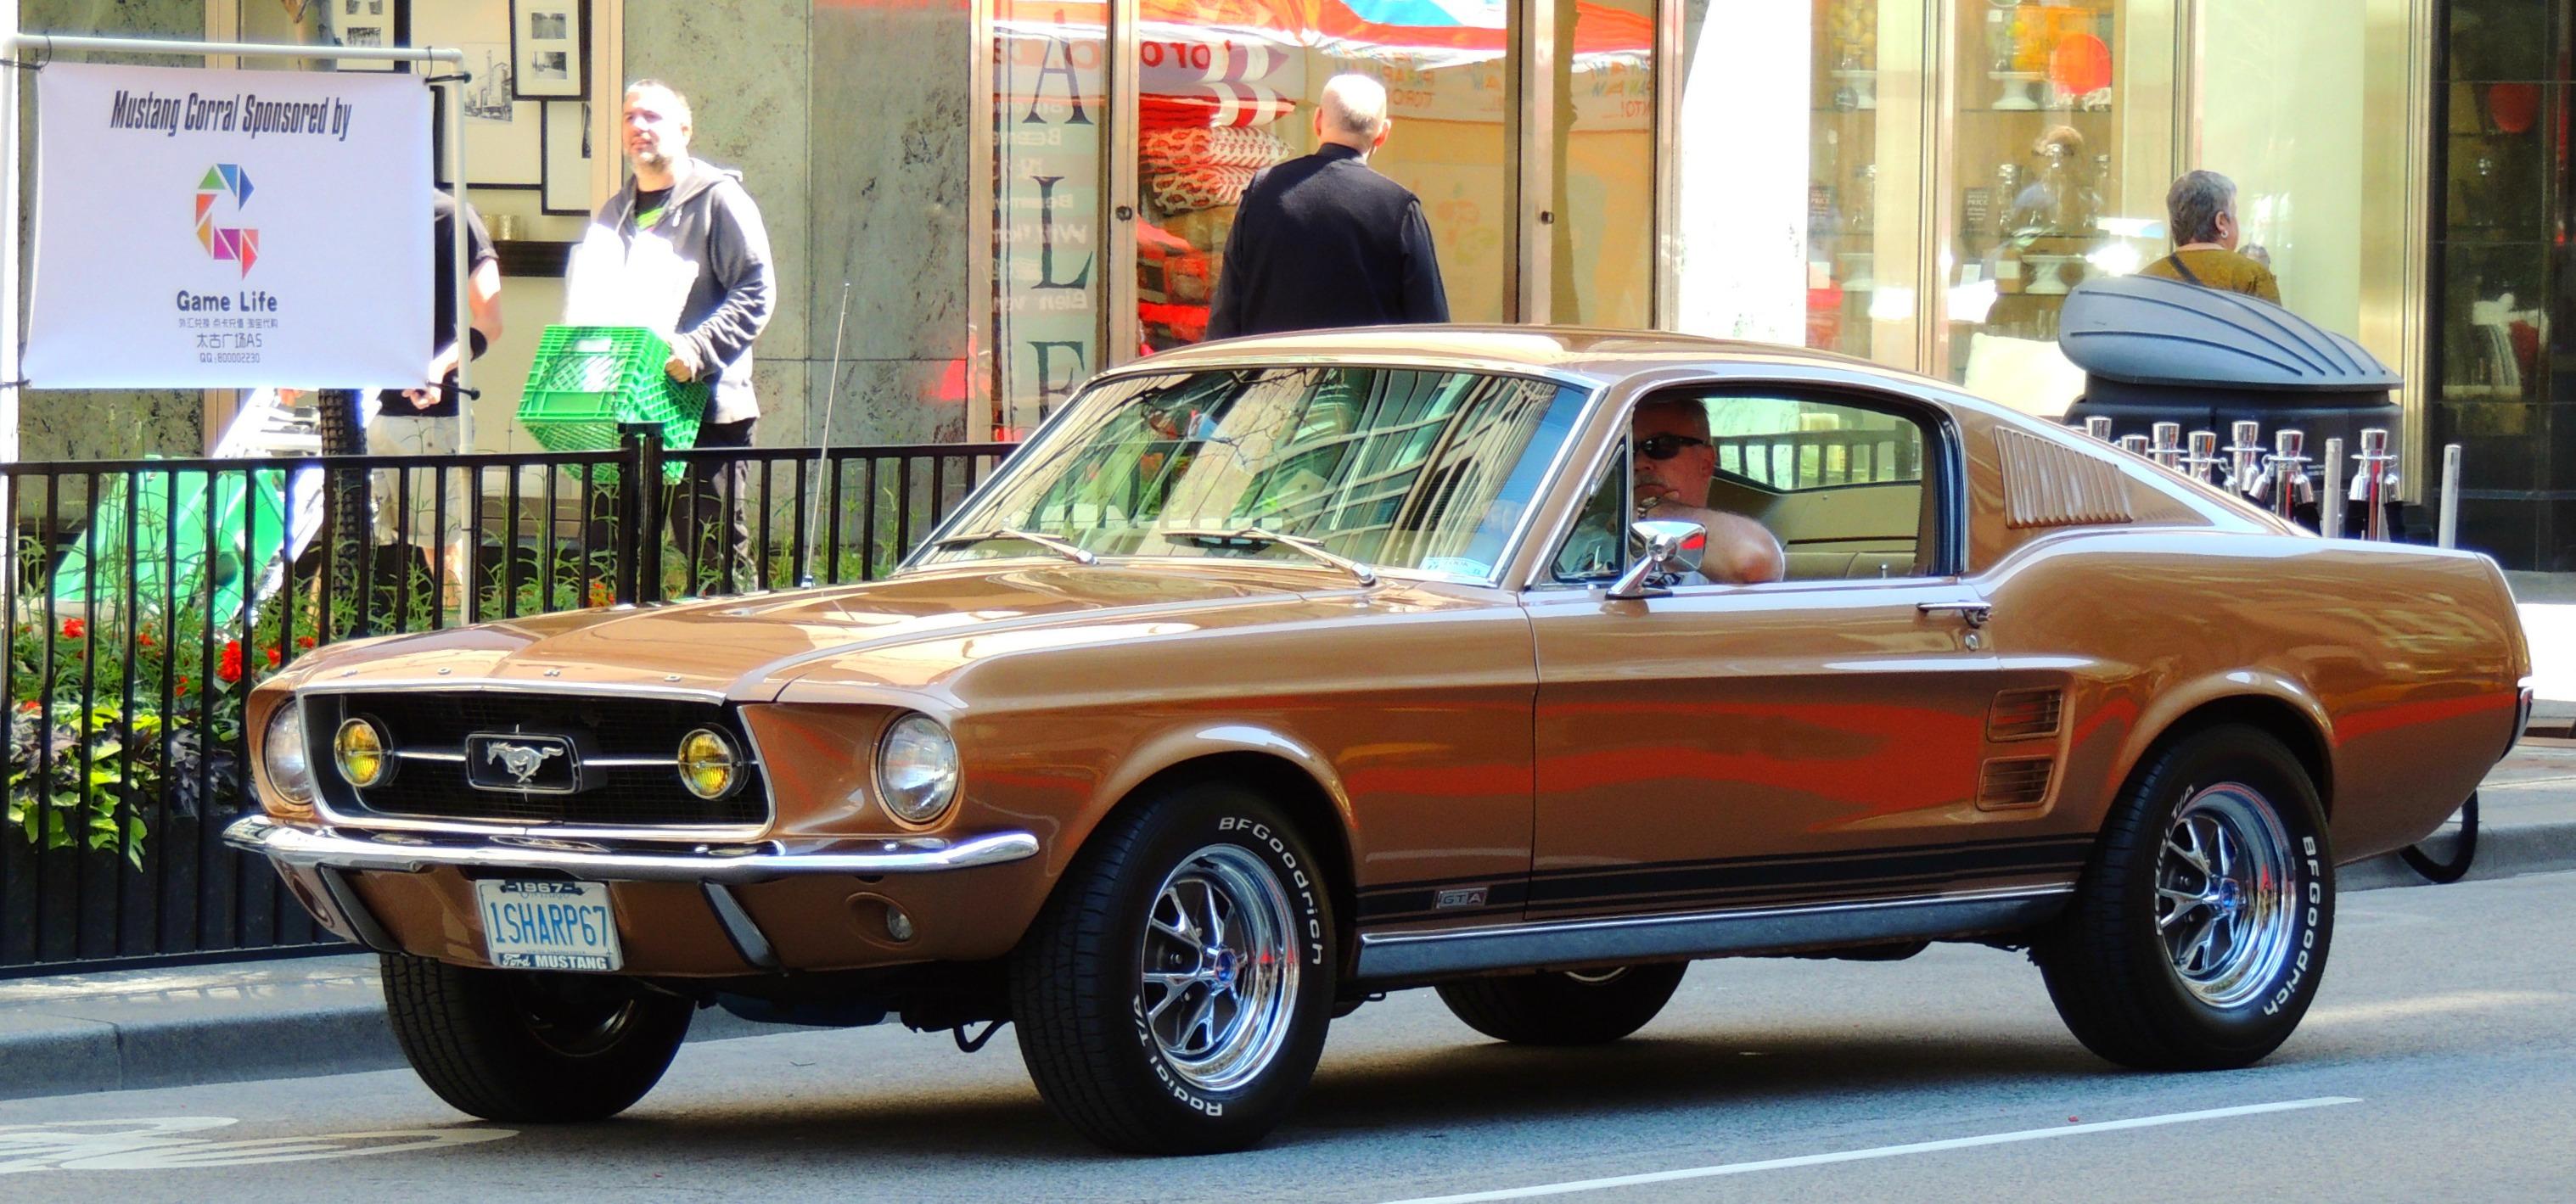 1960s era corgi diecast toy ford mustang fastback 2+2. Wallpaper Toronto Mobil Nikon Antiqueautomobile 1960 Mustang Ford Mustang Musclecar Mobil Sport Fastback Vintageautomobile 1967fordmustang 67ford 1967fordmustangfastback 3035x1419 983437 Hd Wallpapers Wallhere